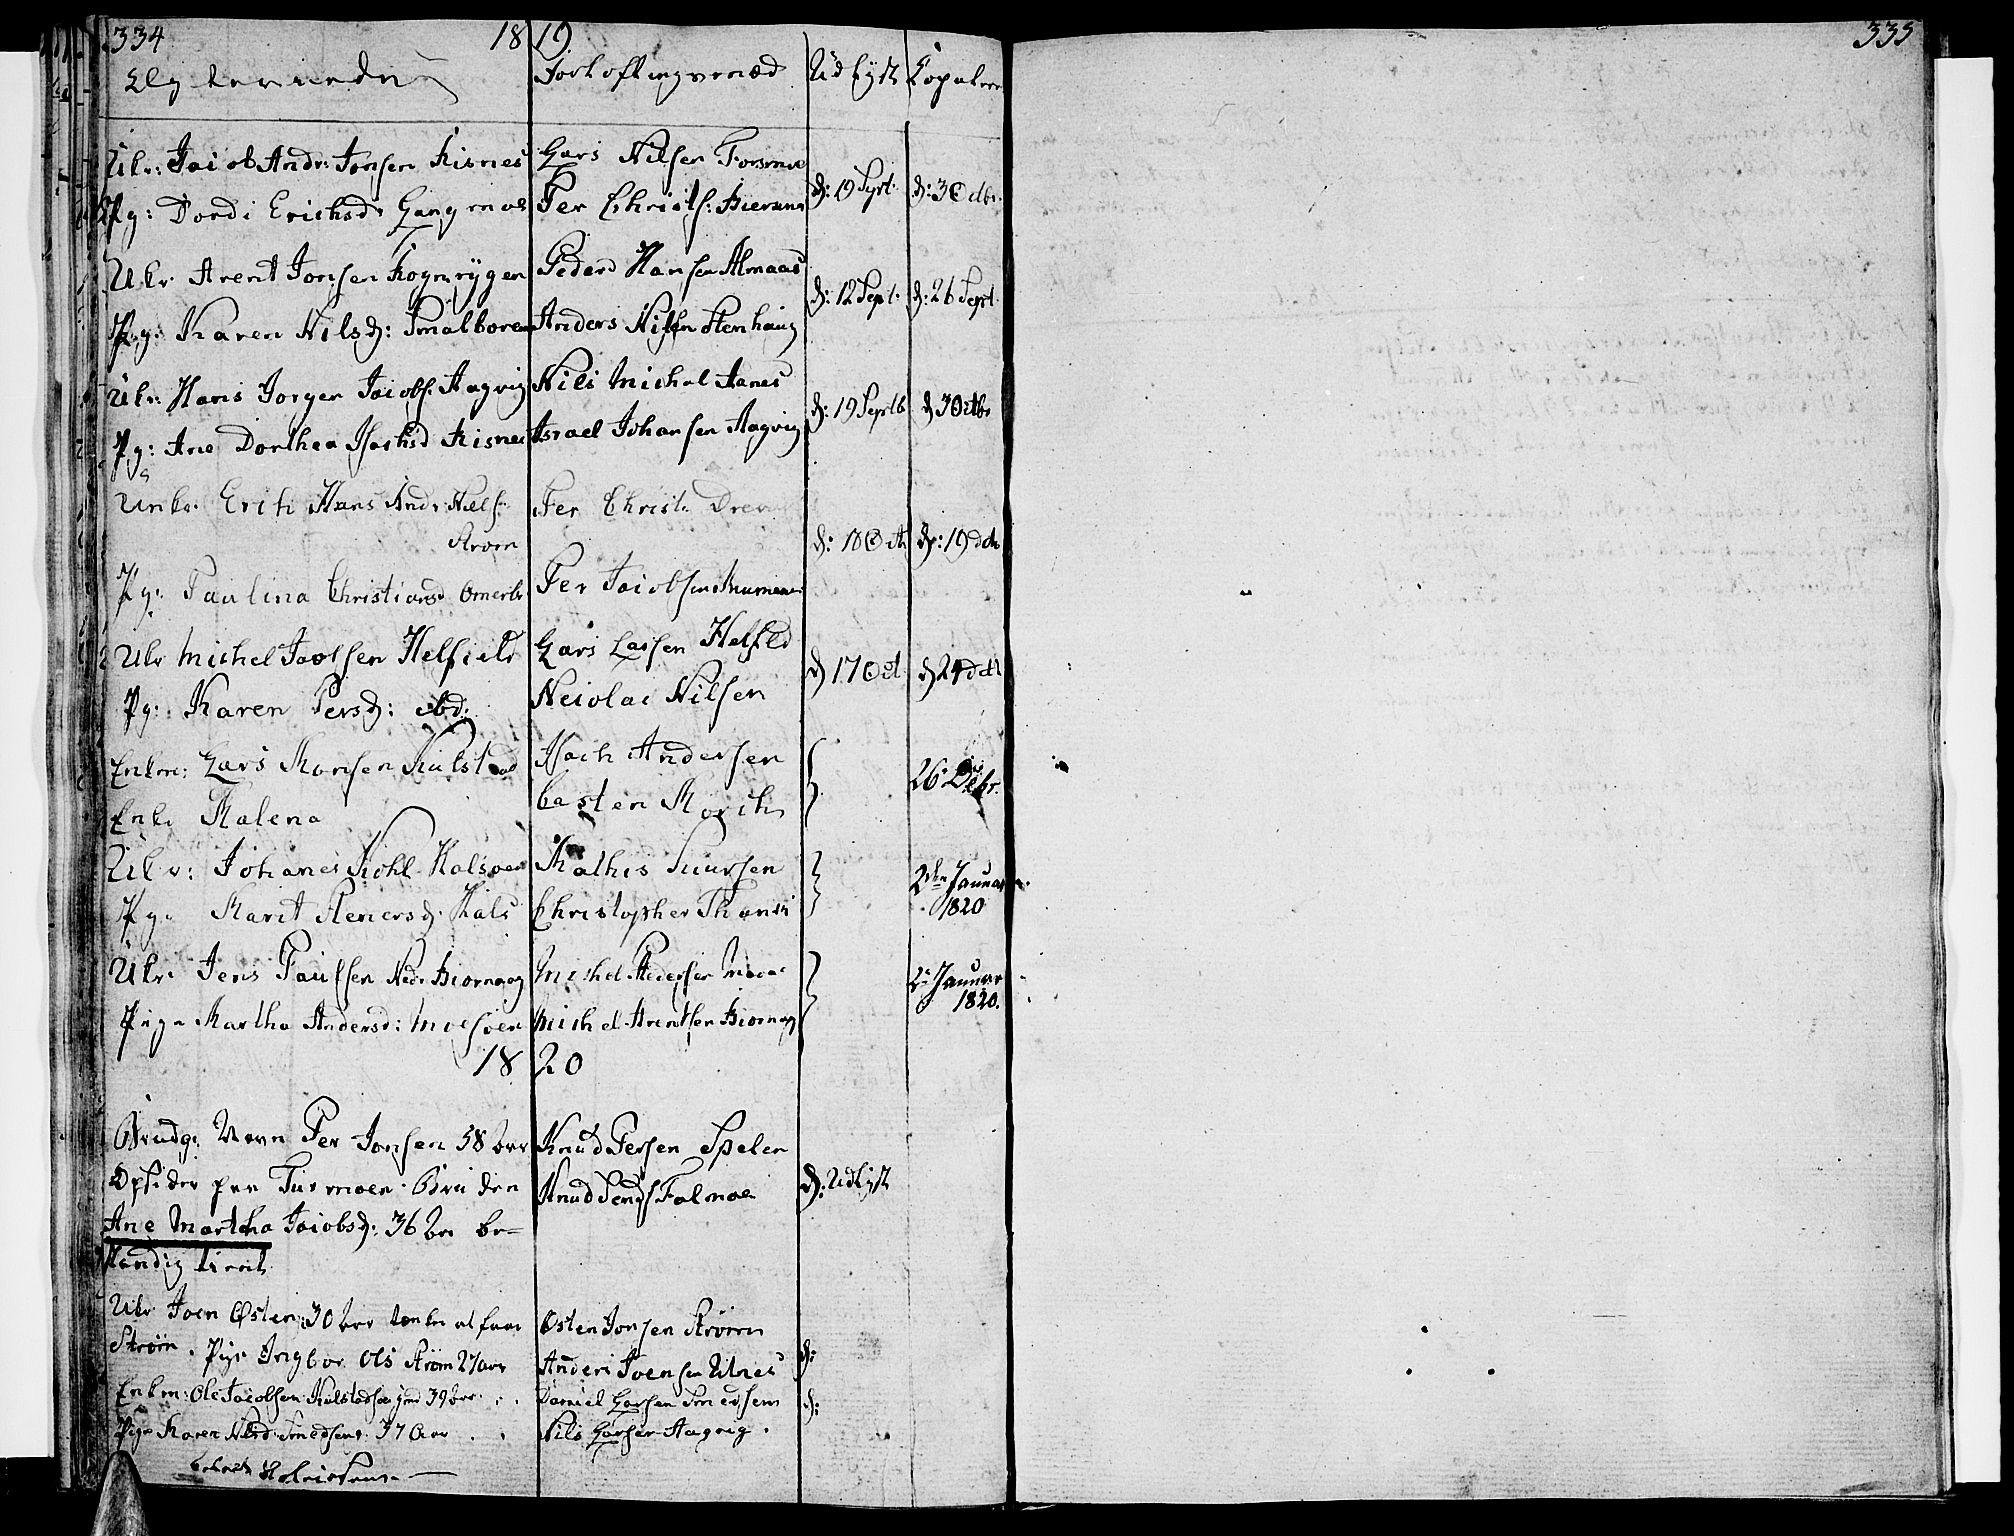 SAT, Ministerialprotokoller, klokkerbøker og fødselsregistre - Nordland, 820/L0287: Ministerialbok nr. 820A08, 1800-1819, s. 334-335